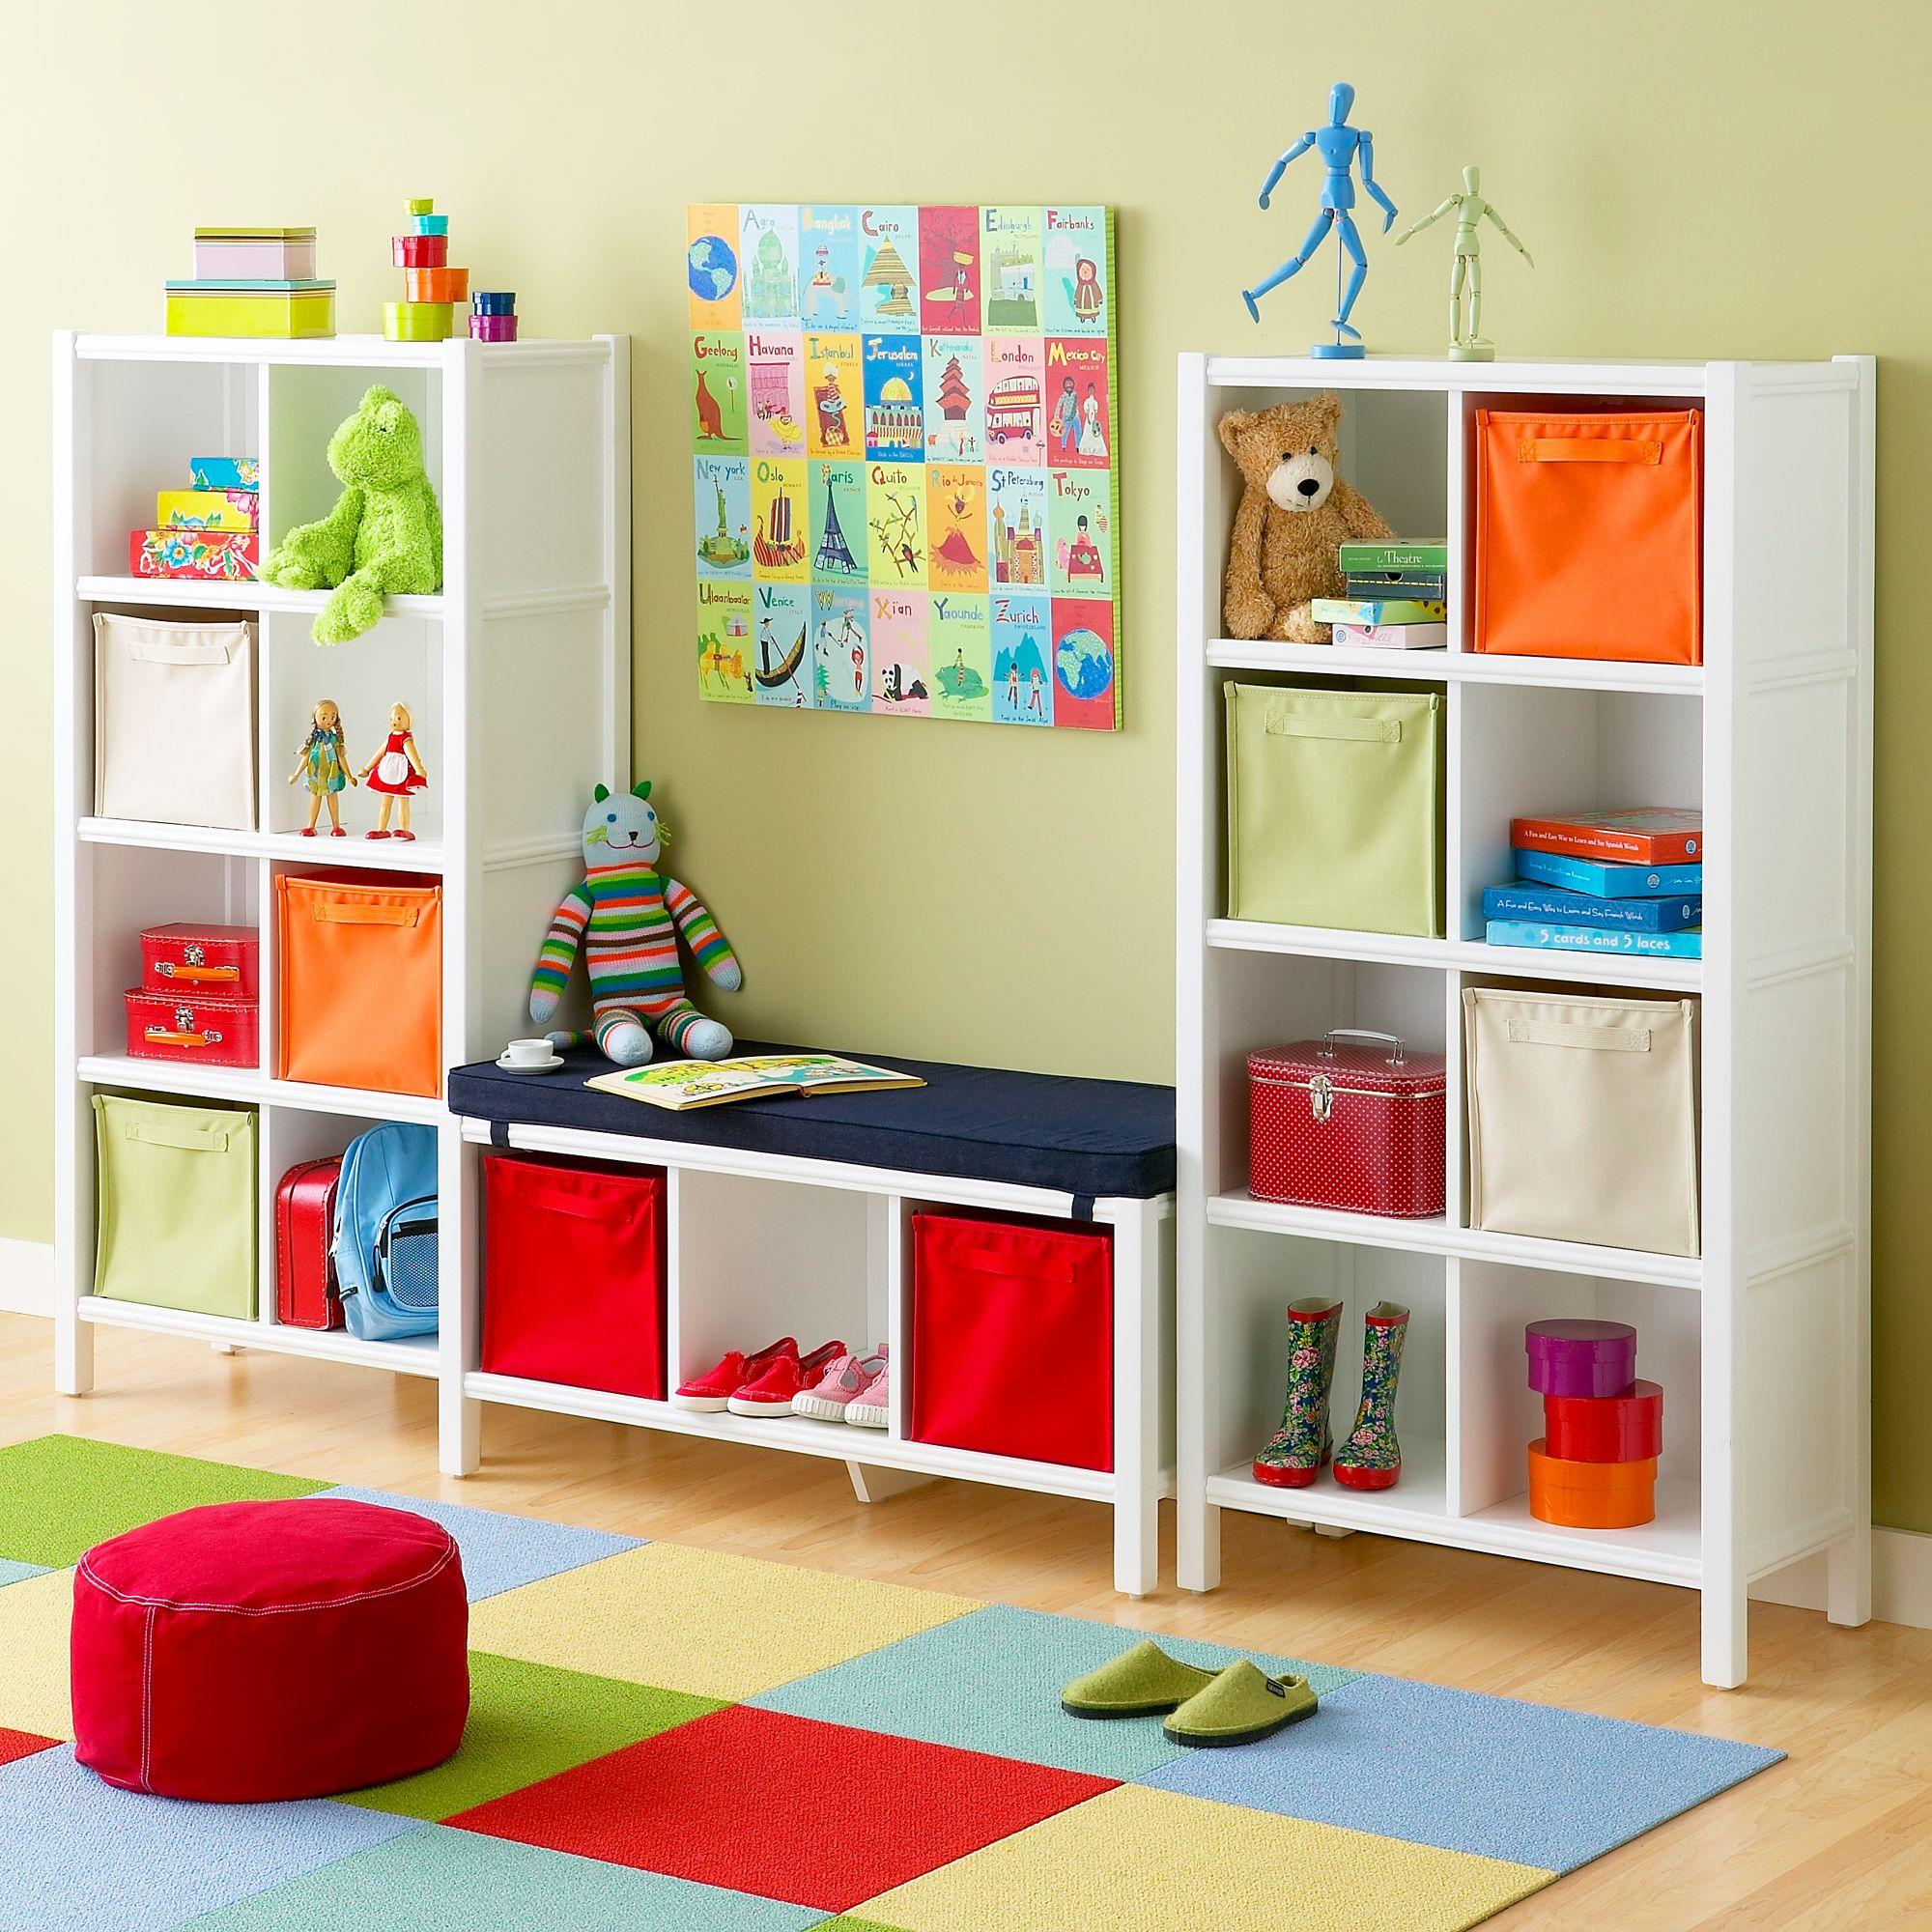 Cupboard In Kids Bedroom Ideas (Image 3 of 10)